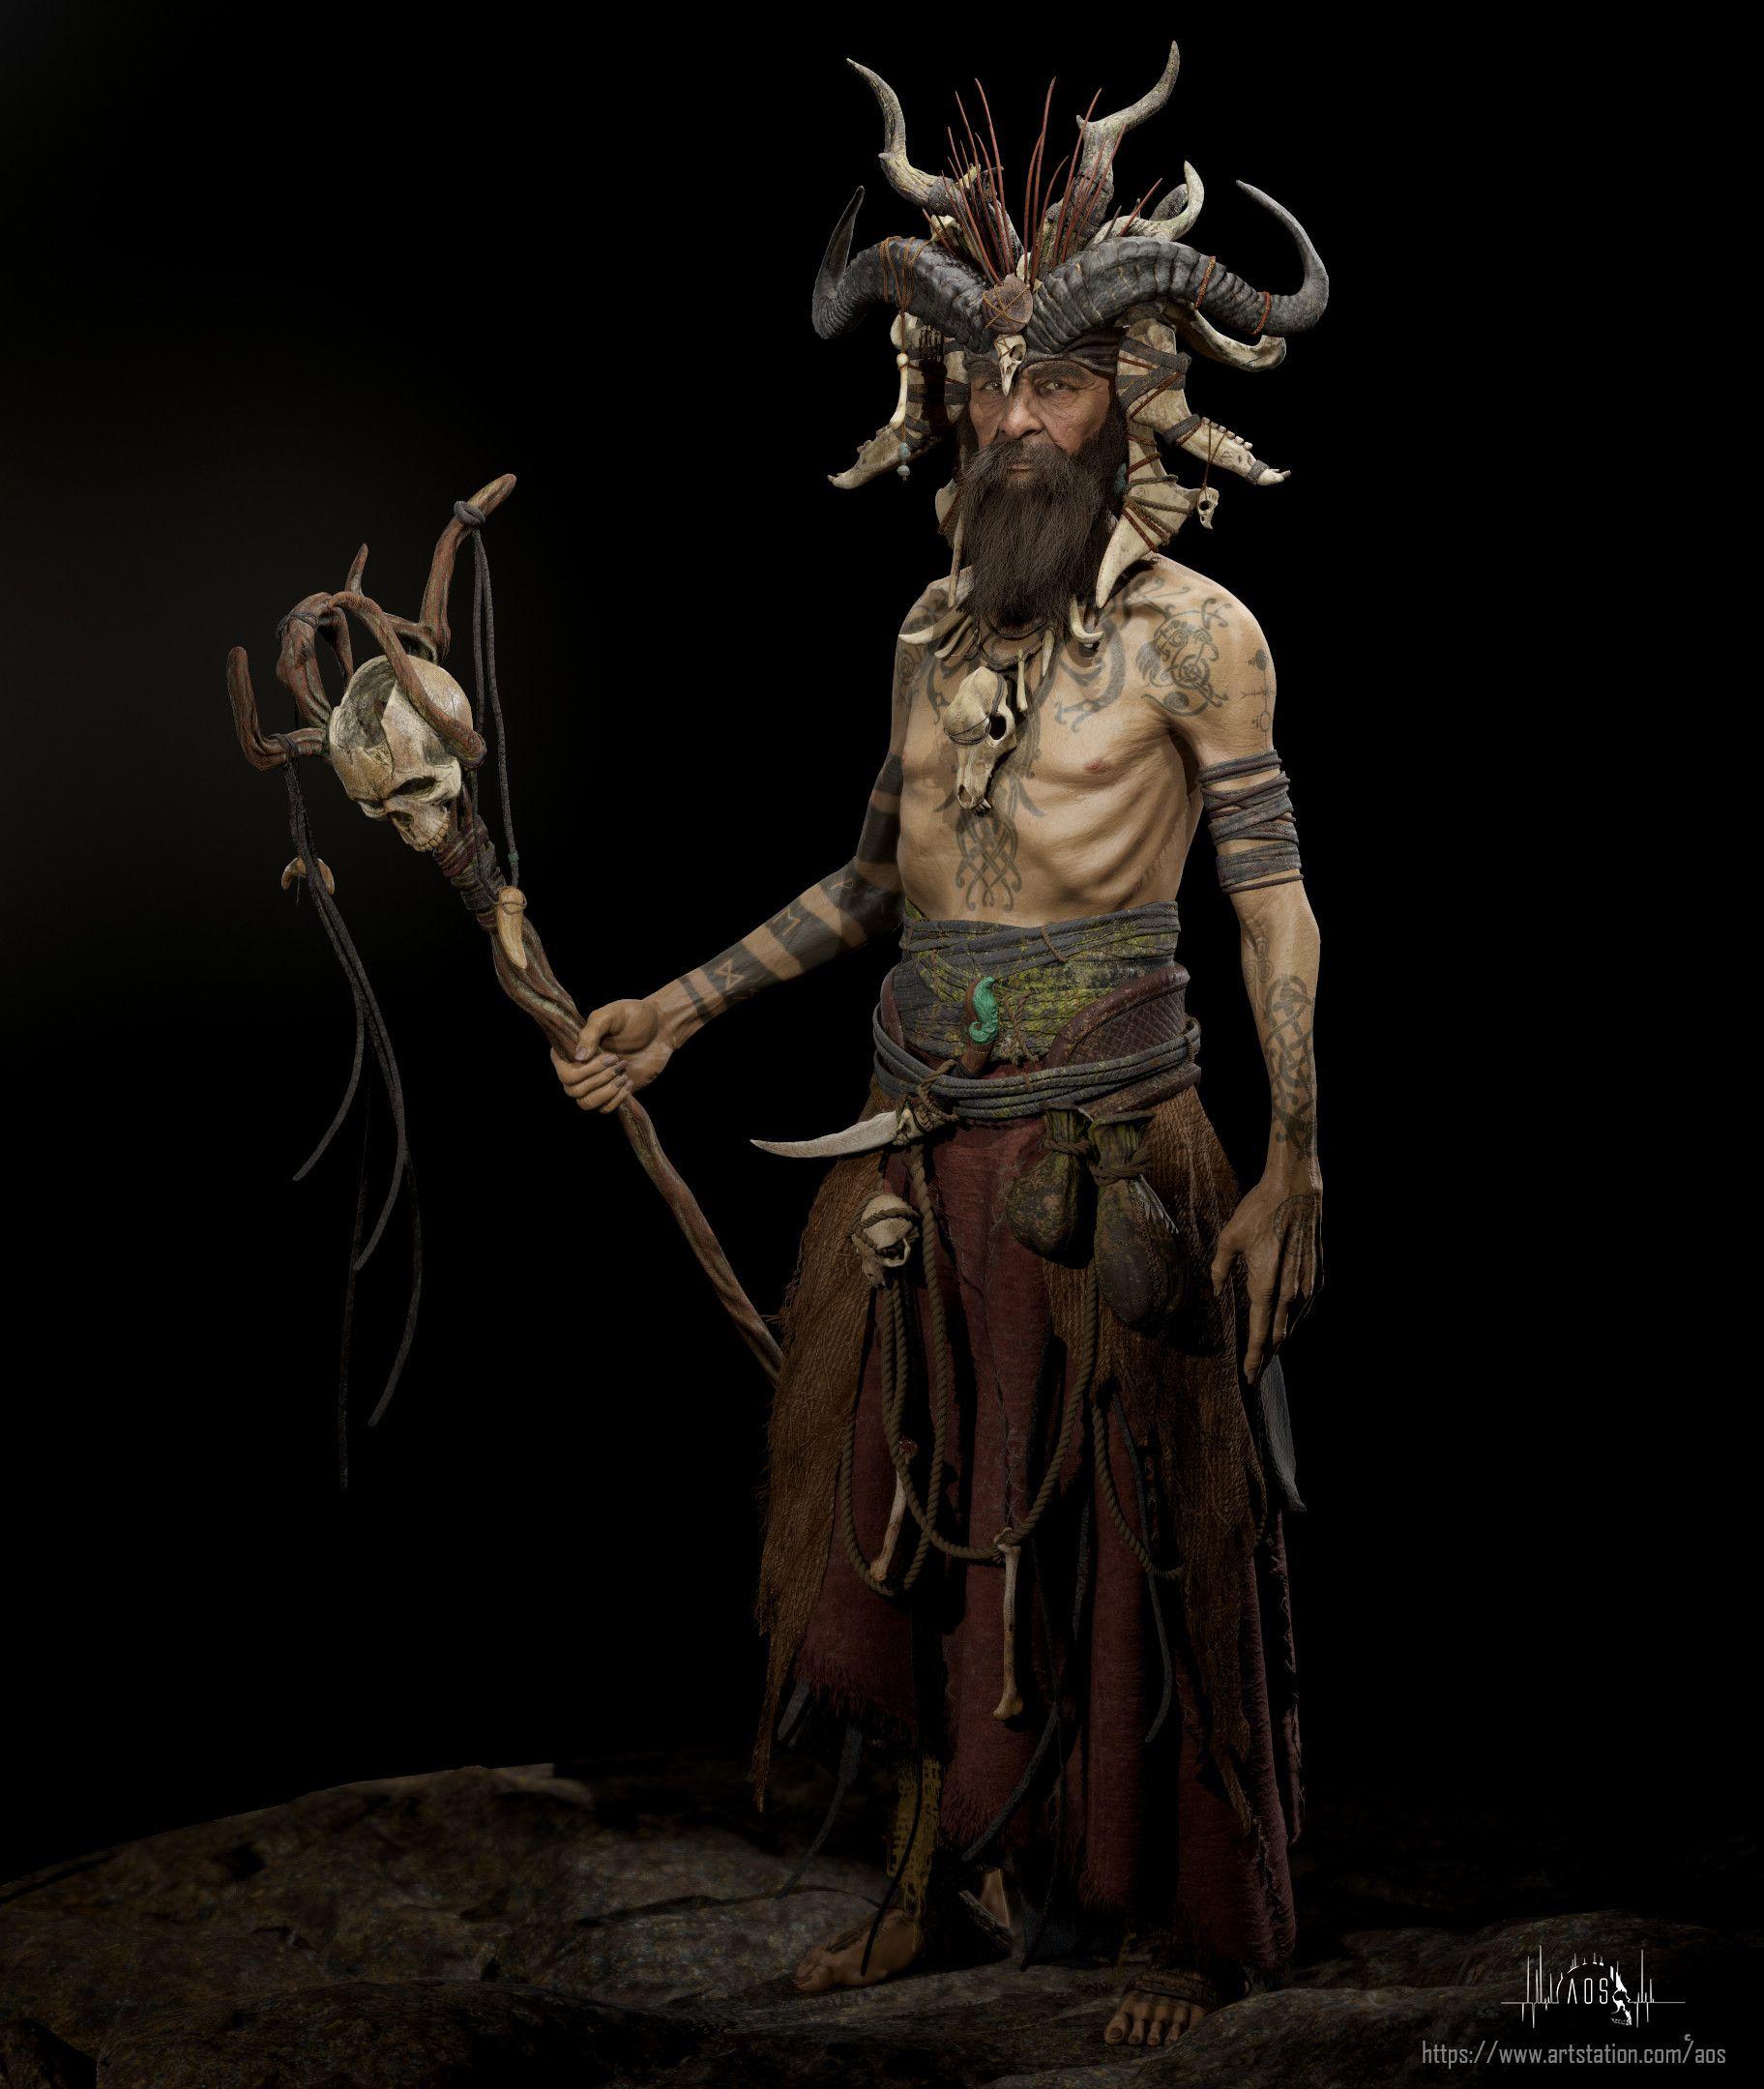 531b243ee4a ArtStation - Norse Shaman, Alejandro Olmo (AOS) | FS_Inspiration in ...